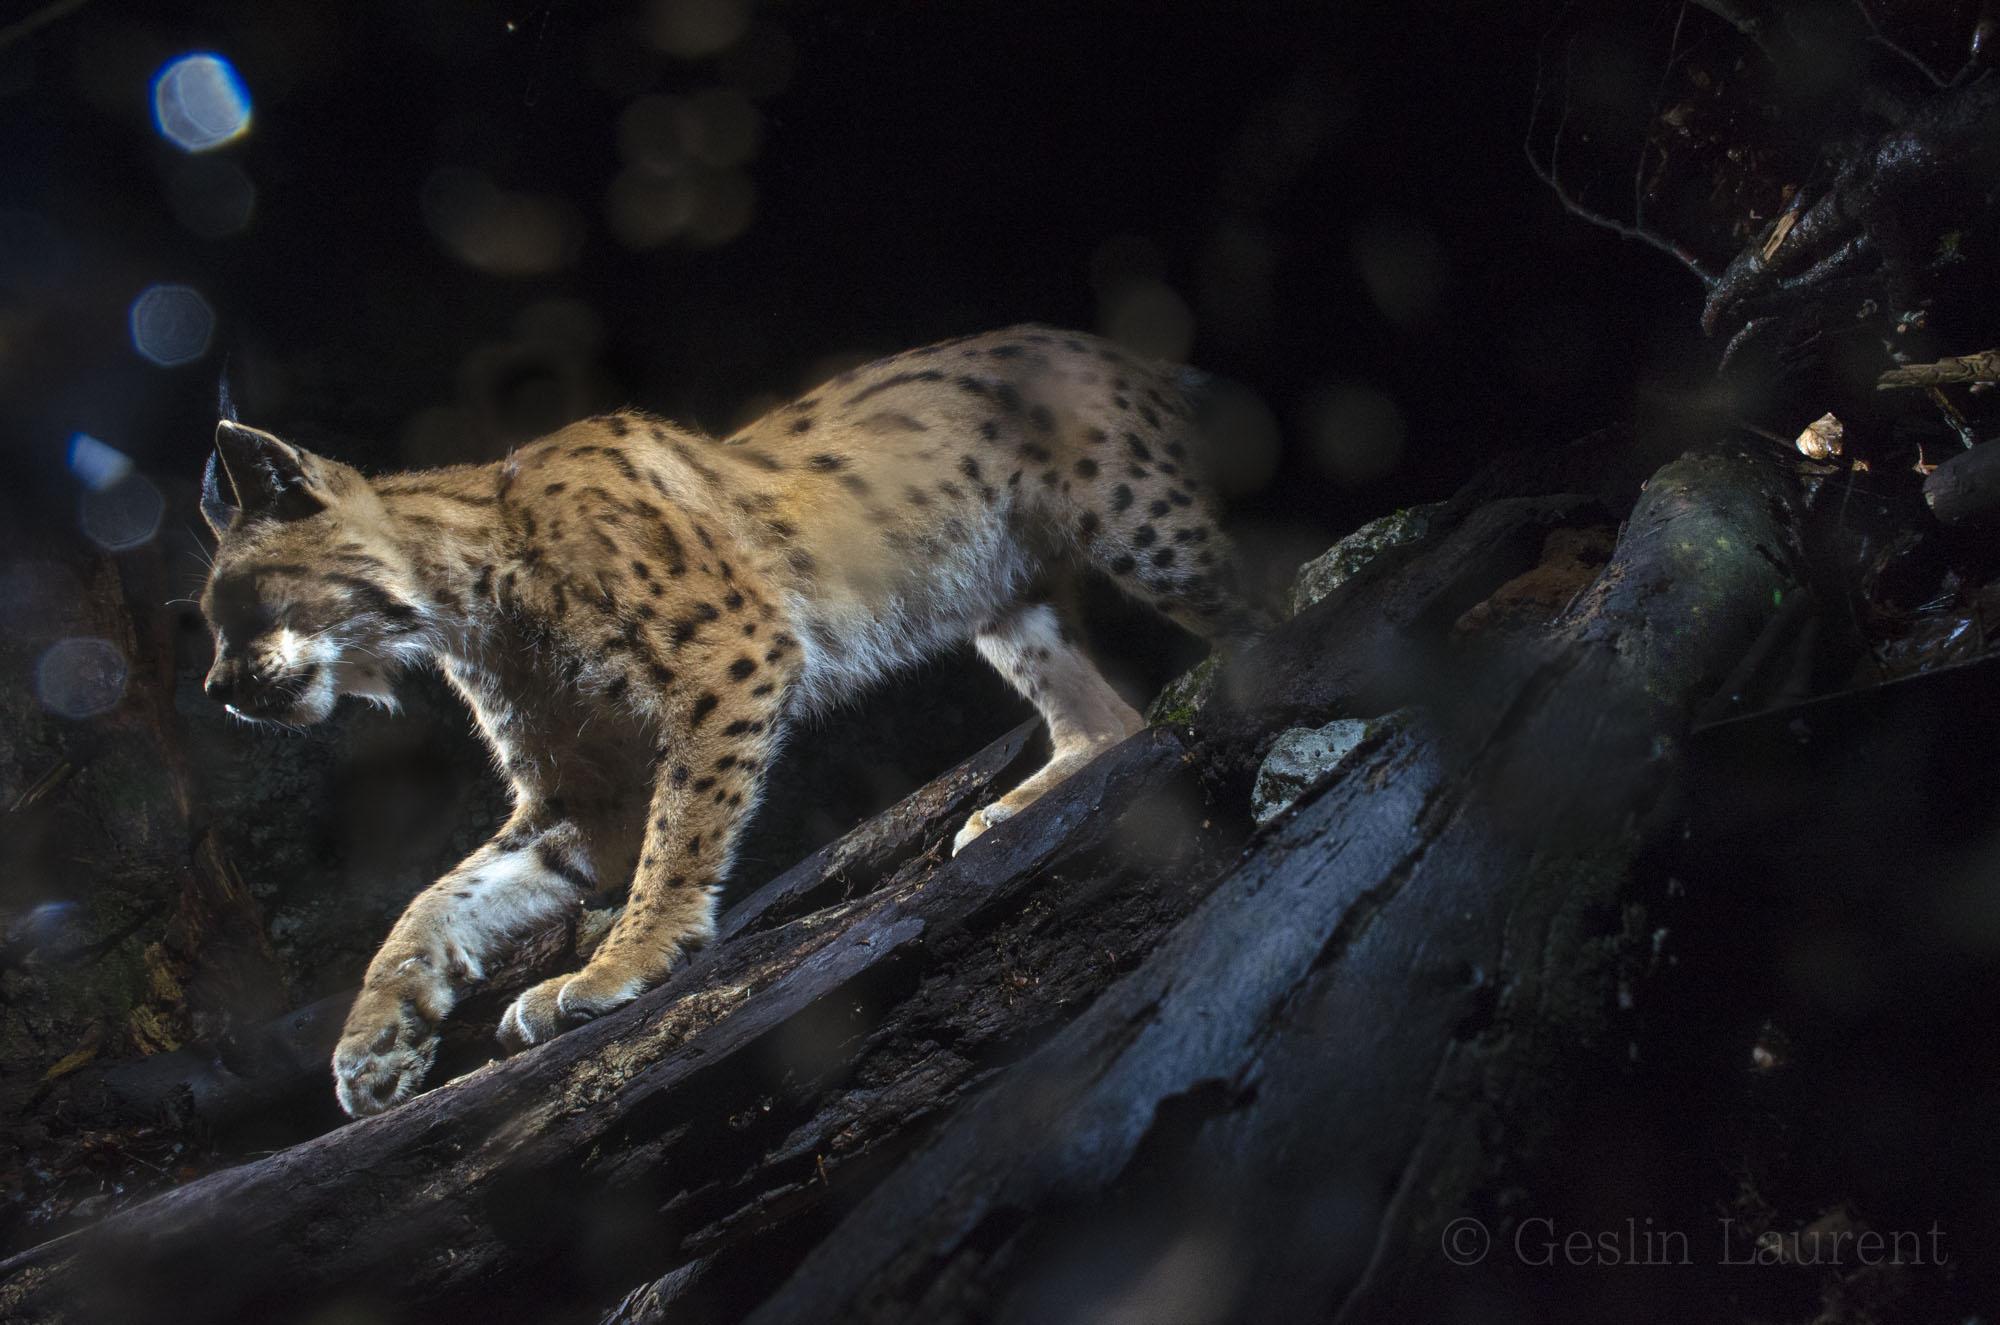 Cougar and prey i - 5 2